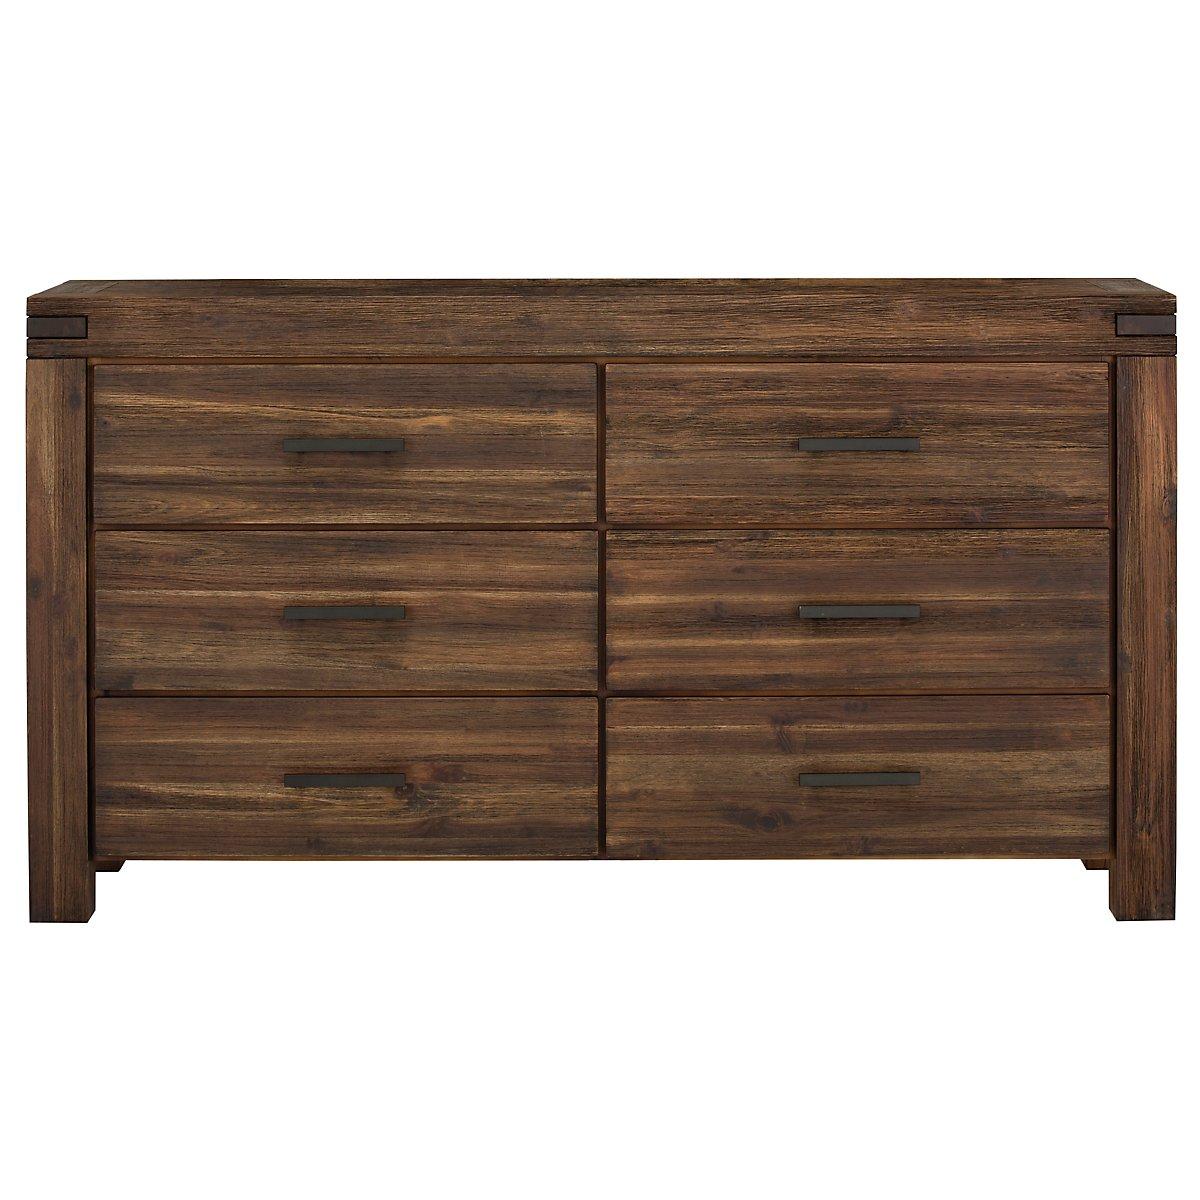 Holden Mid Tone Dresser